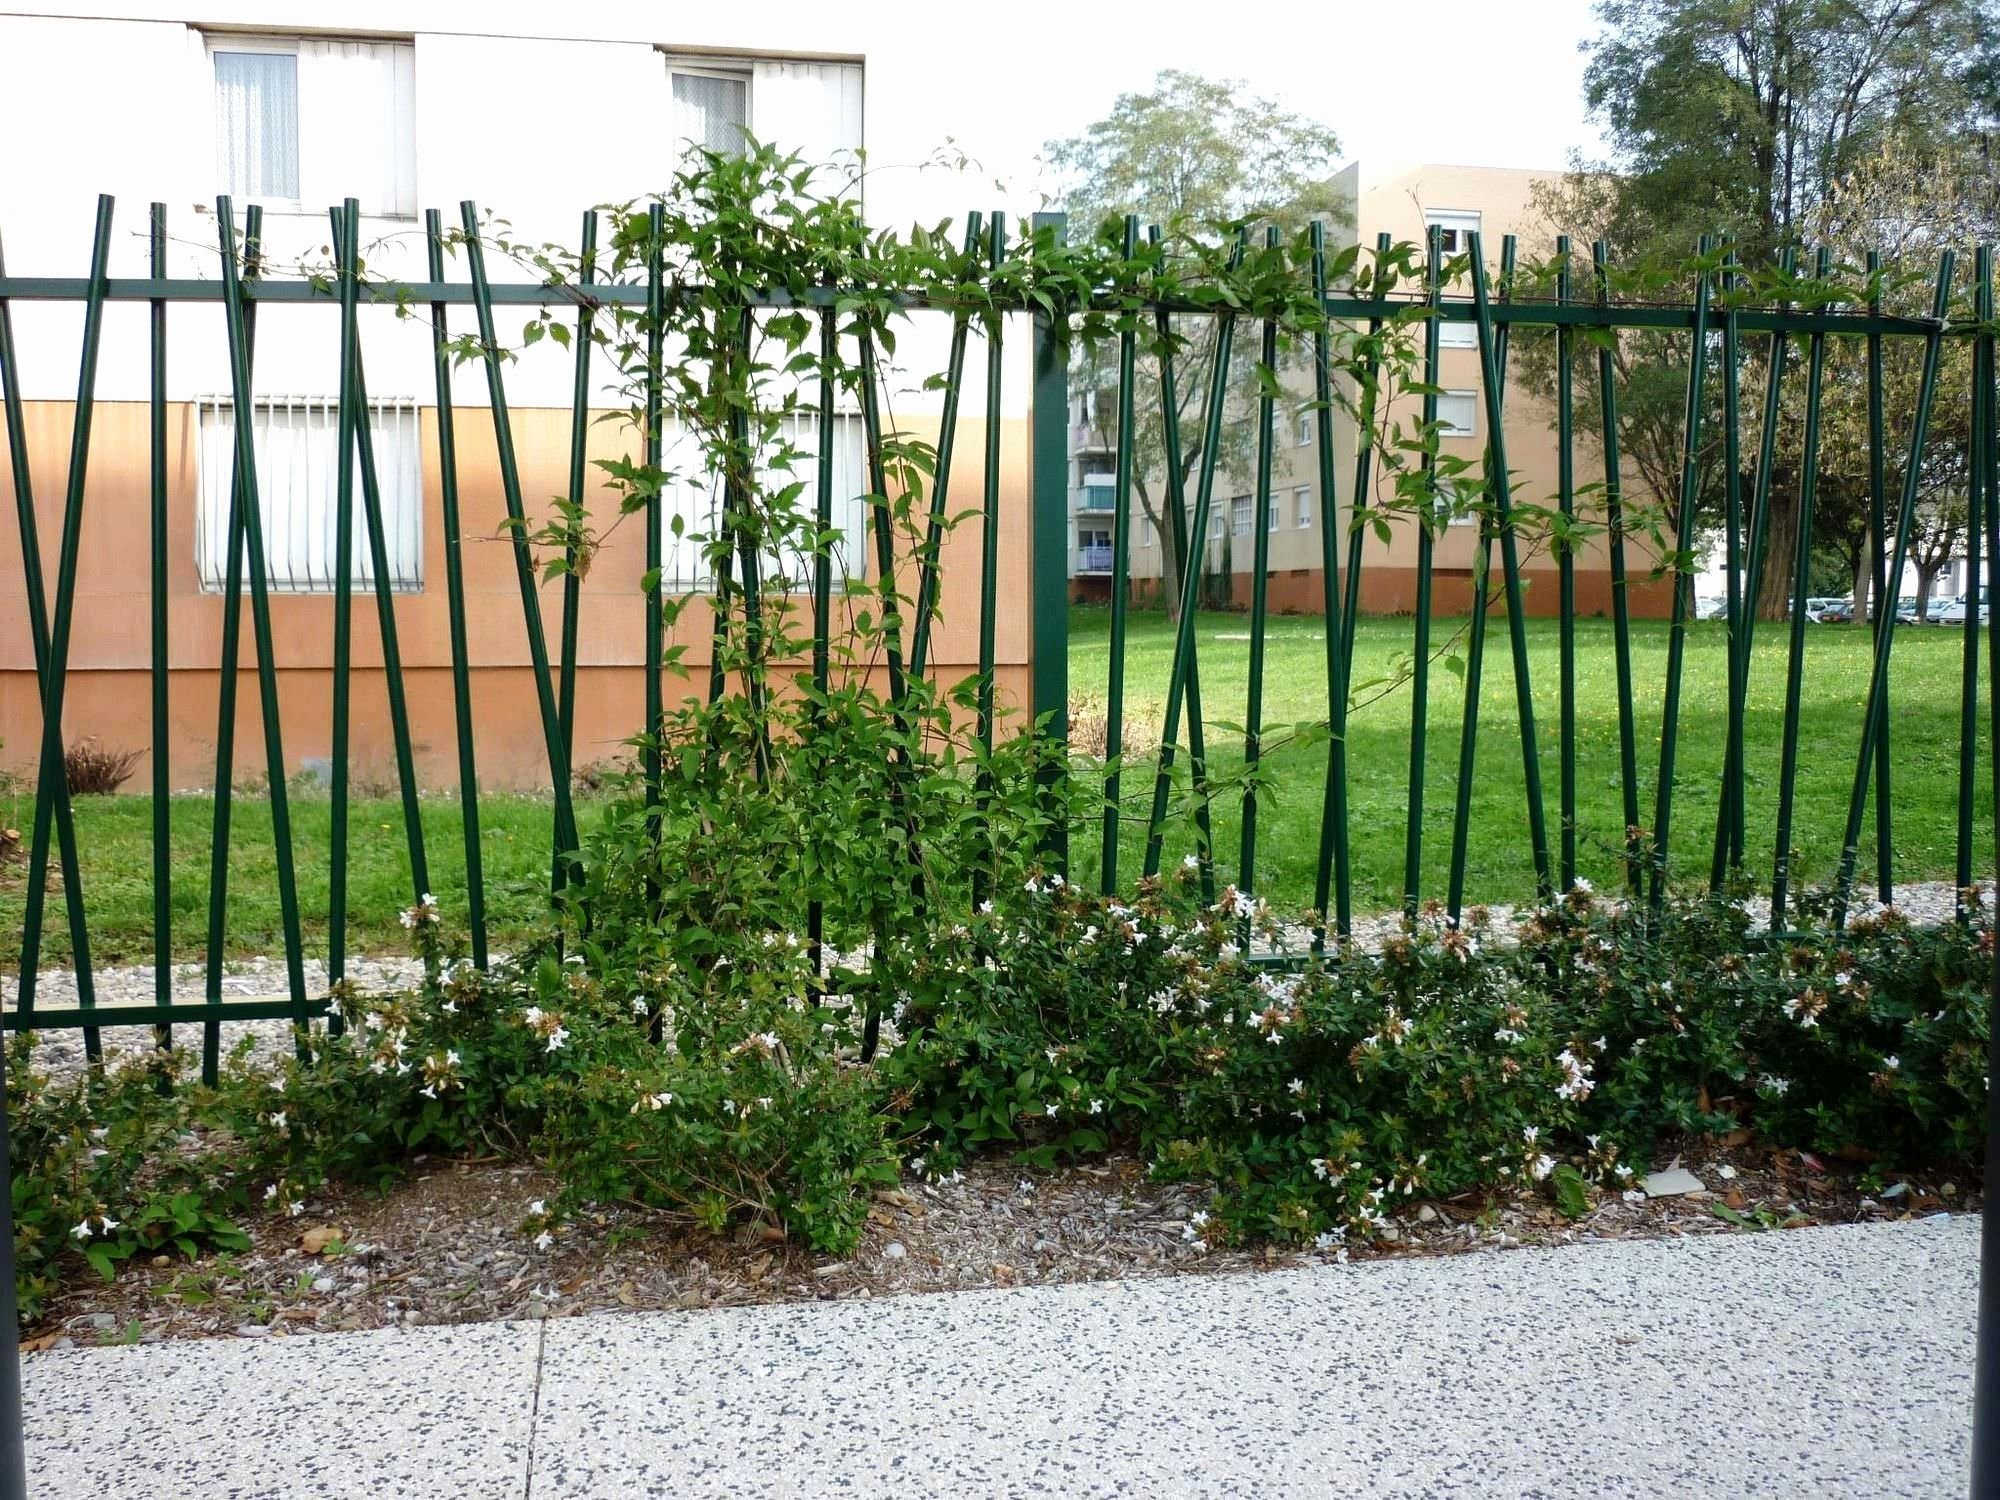 Toile Paillage Jardin Paillage Jardin Jardins En Bois Cloture Jardin